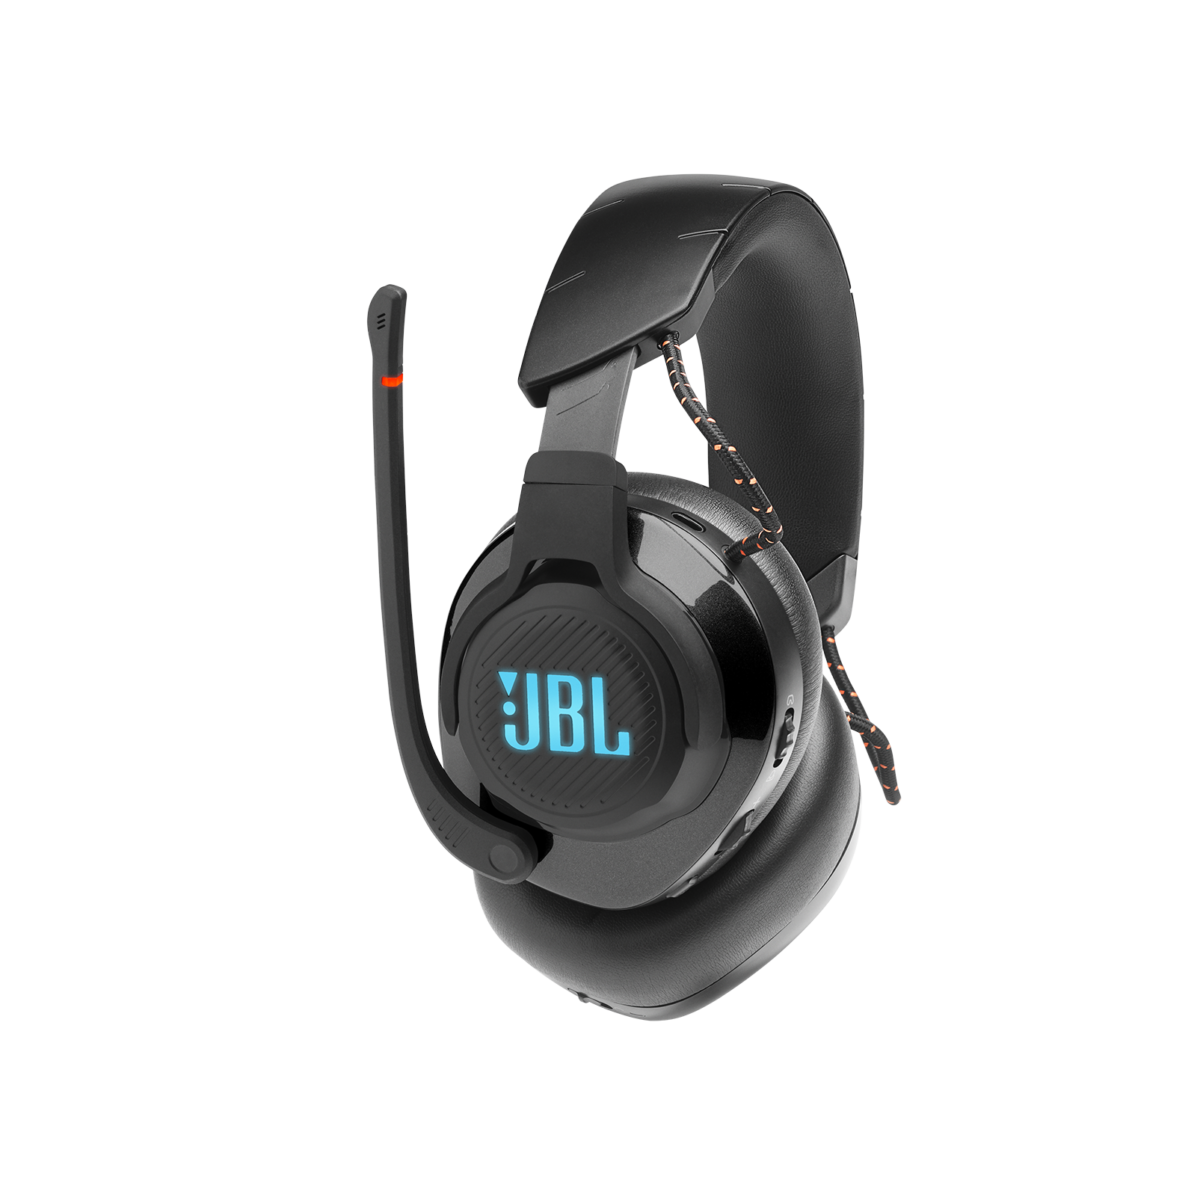 JBL QUANTUM 600 Product Image Side Mic Up Teal